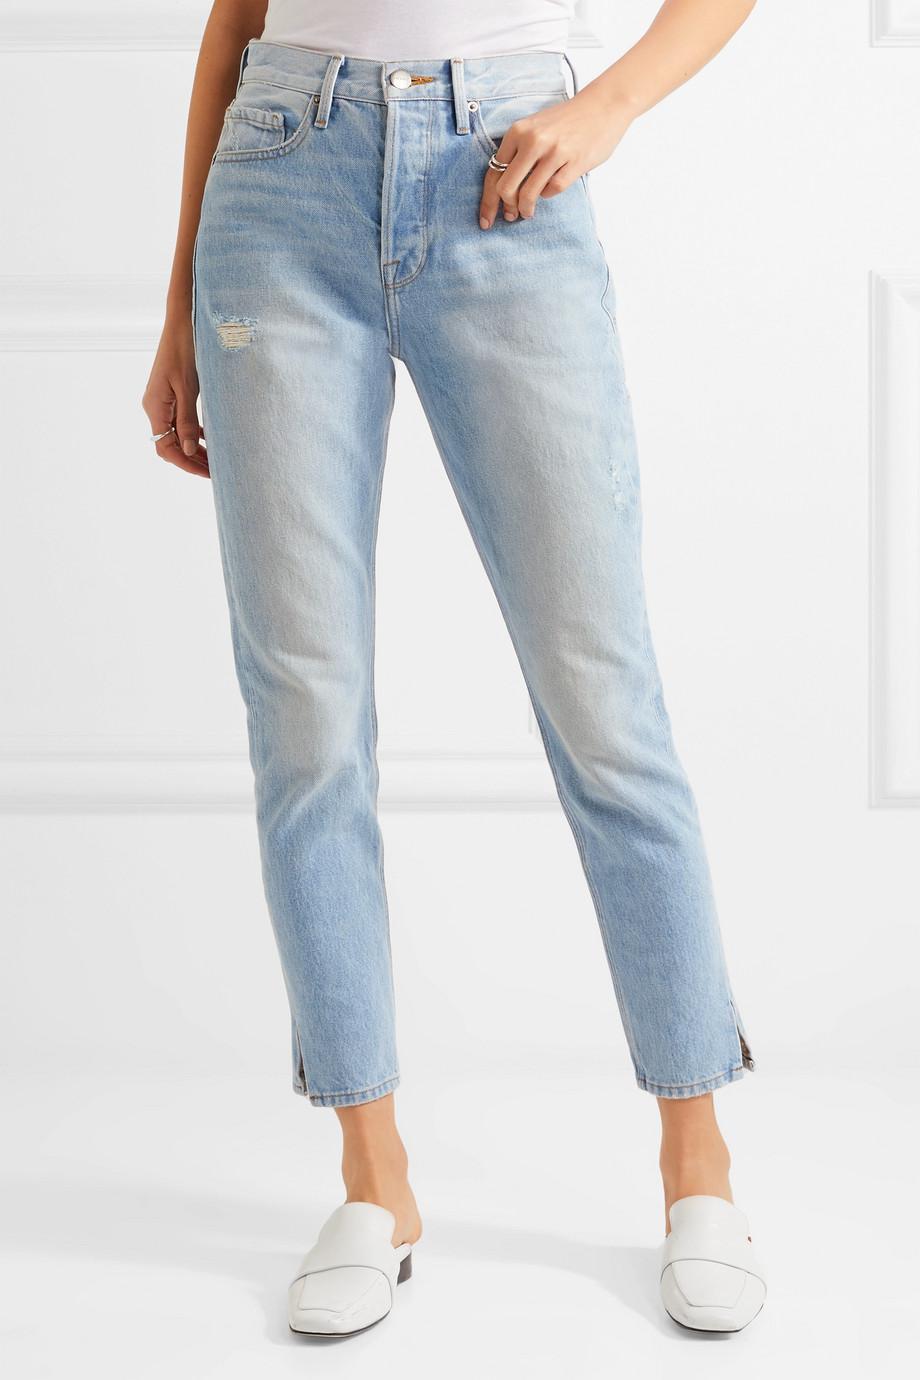 Le Original Skinny Distressed High-rise Straight-leg Jeans - Blue Frame Denim kq2KMN